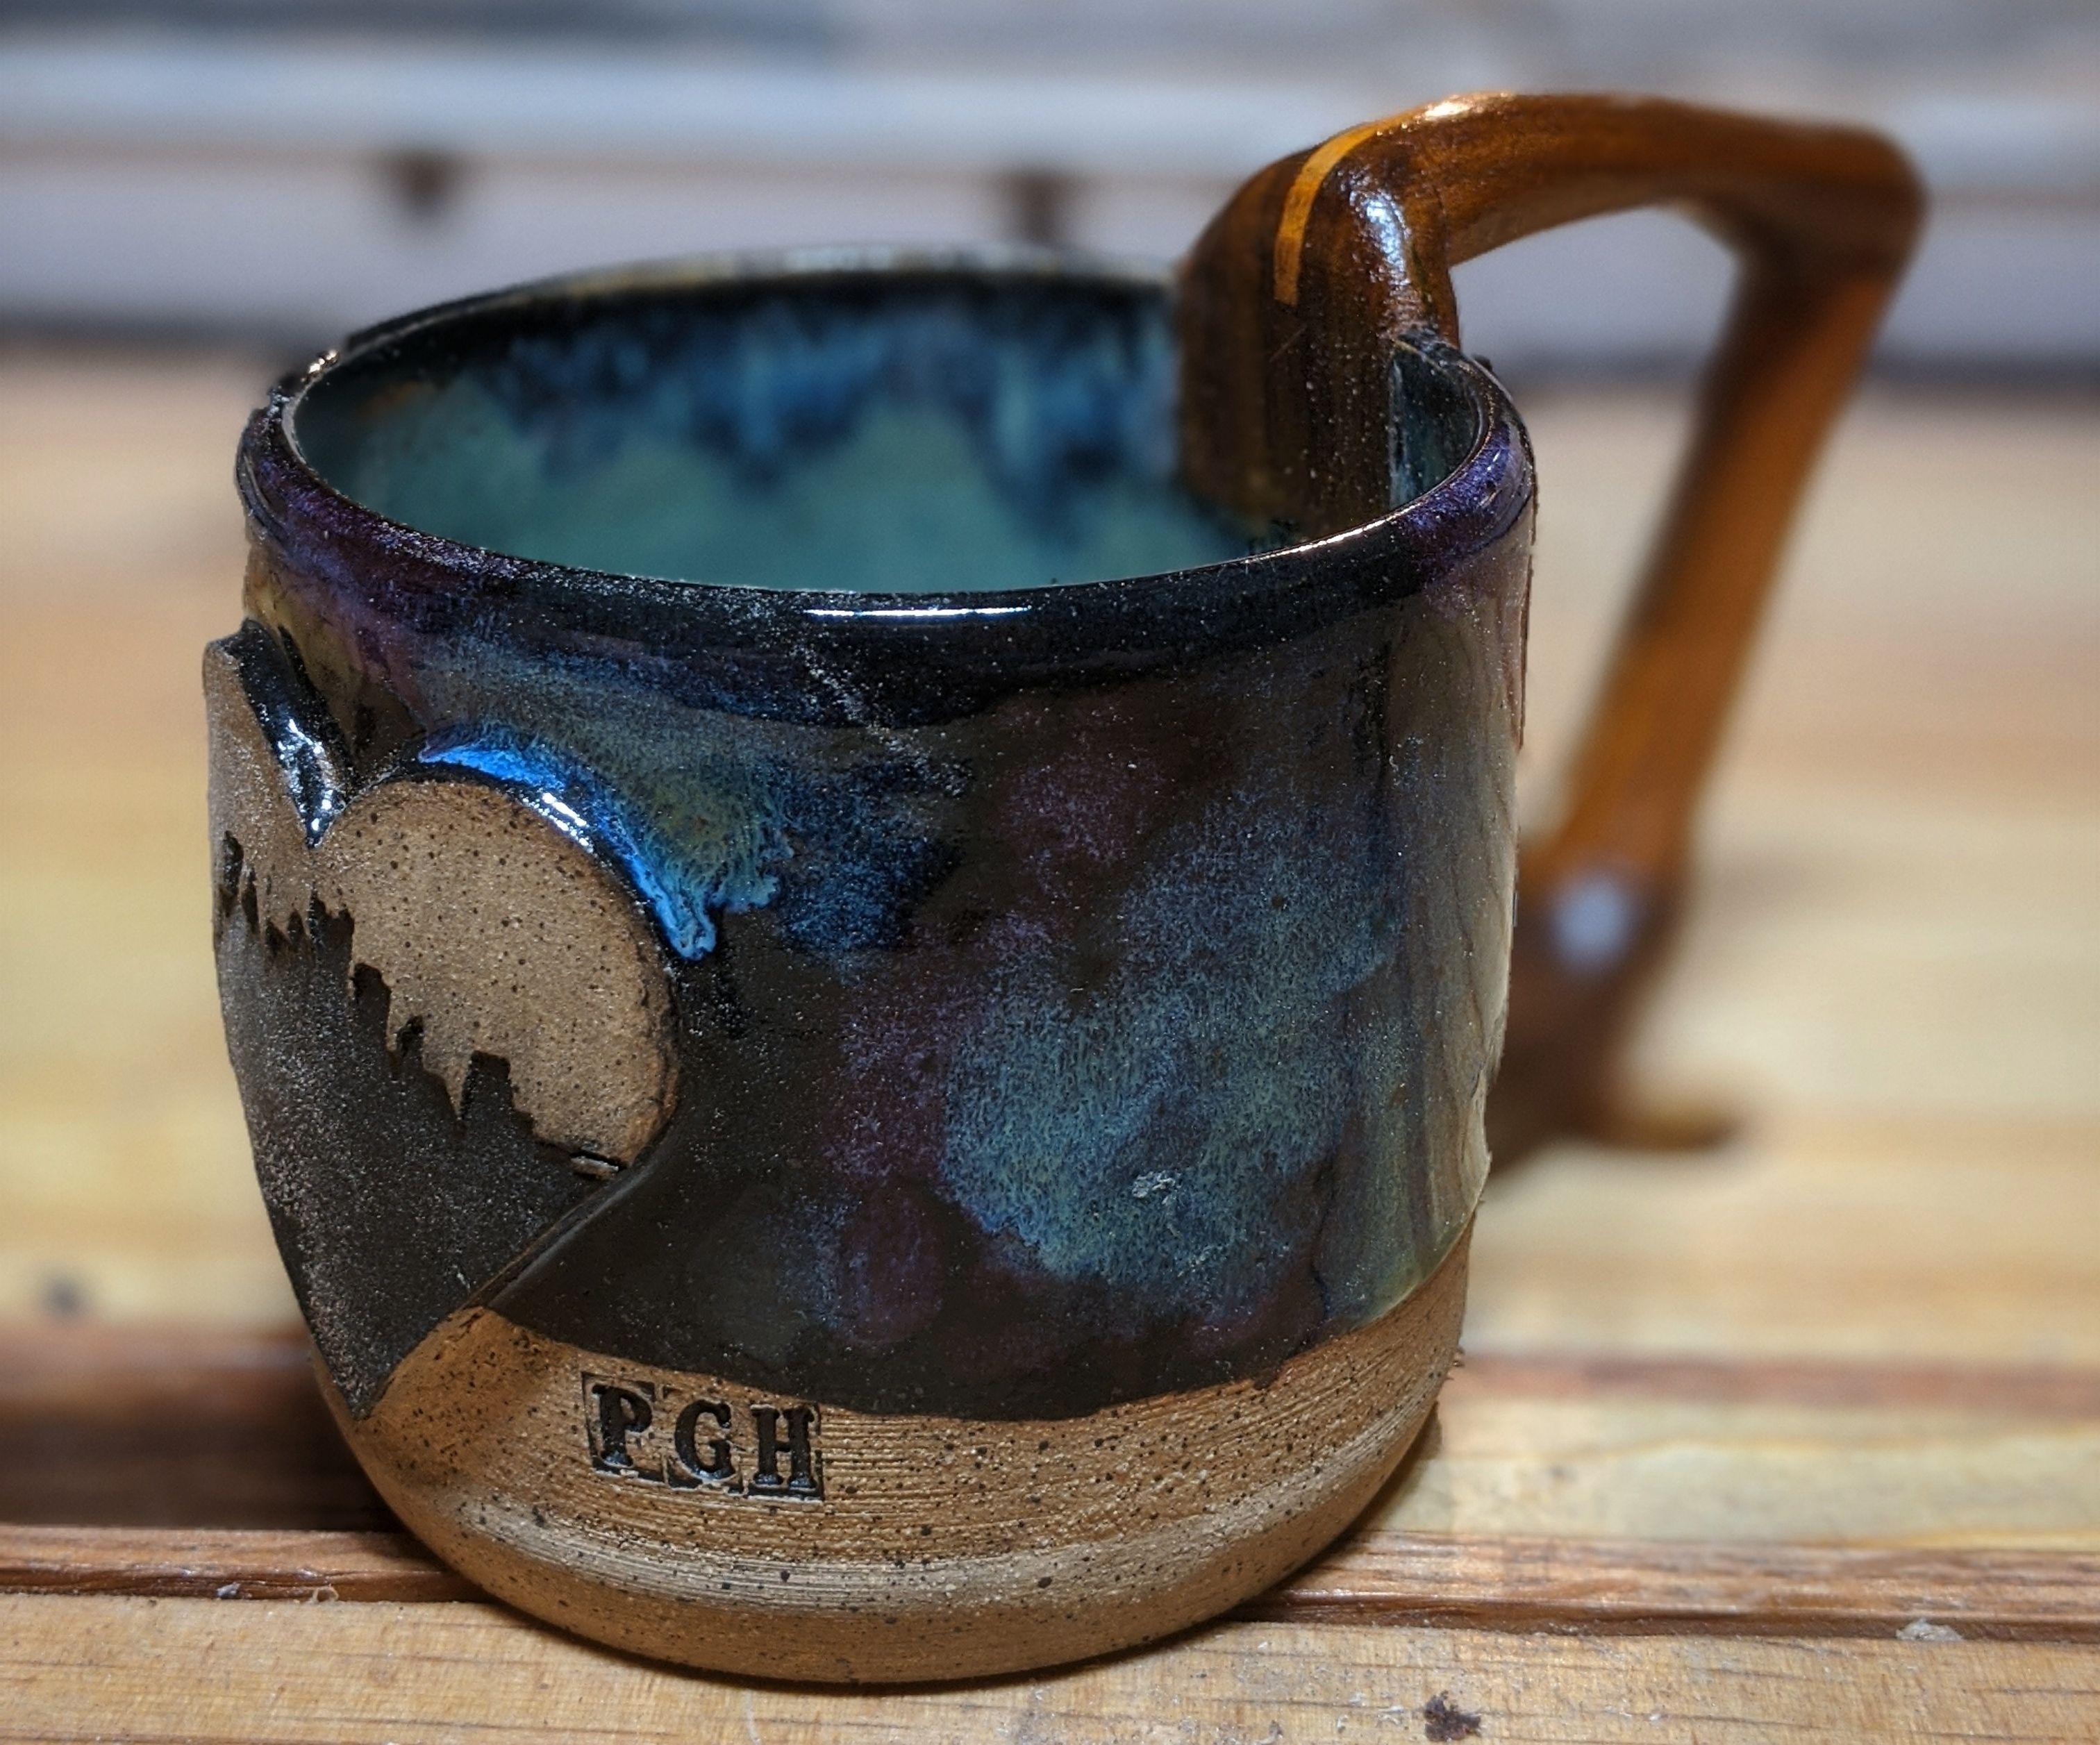 Ceramic Mug With Wooden Handle